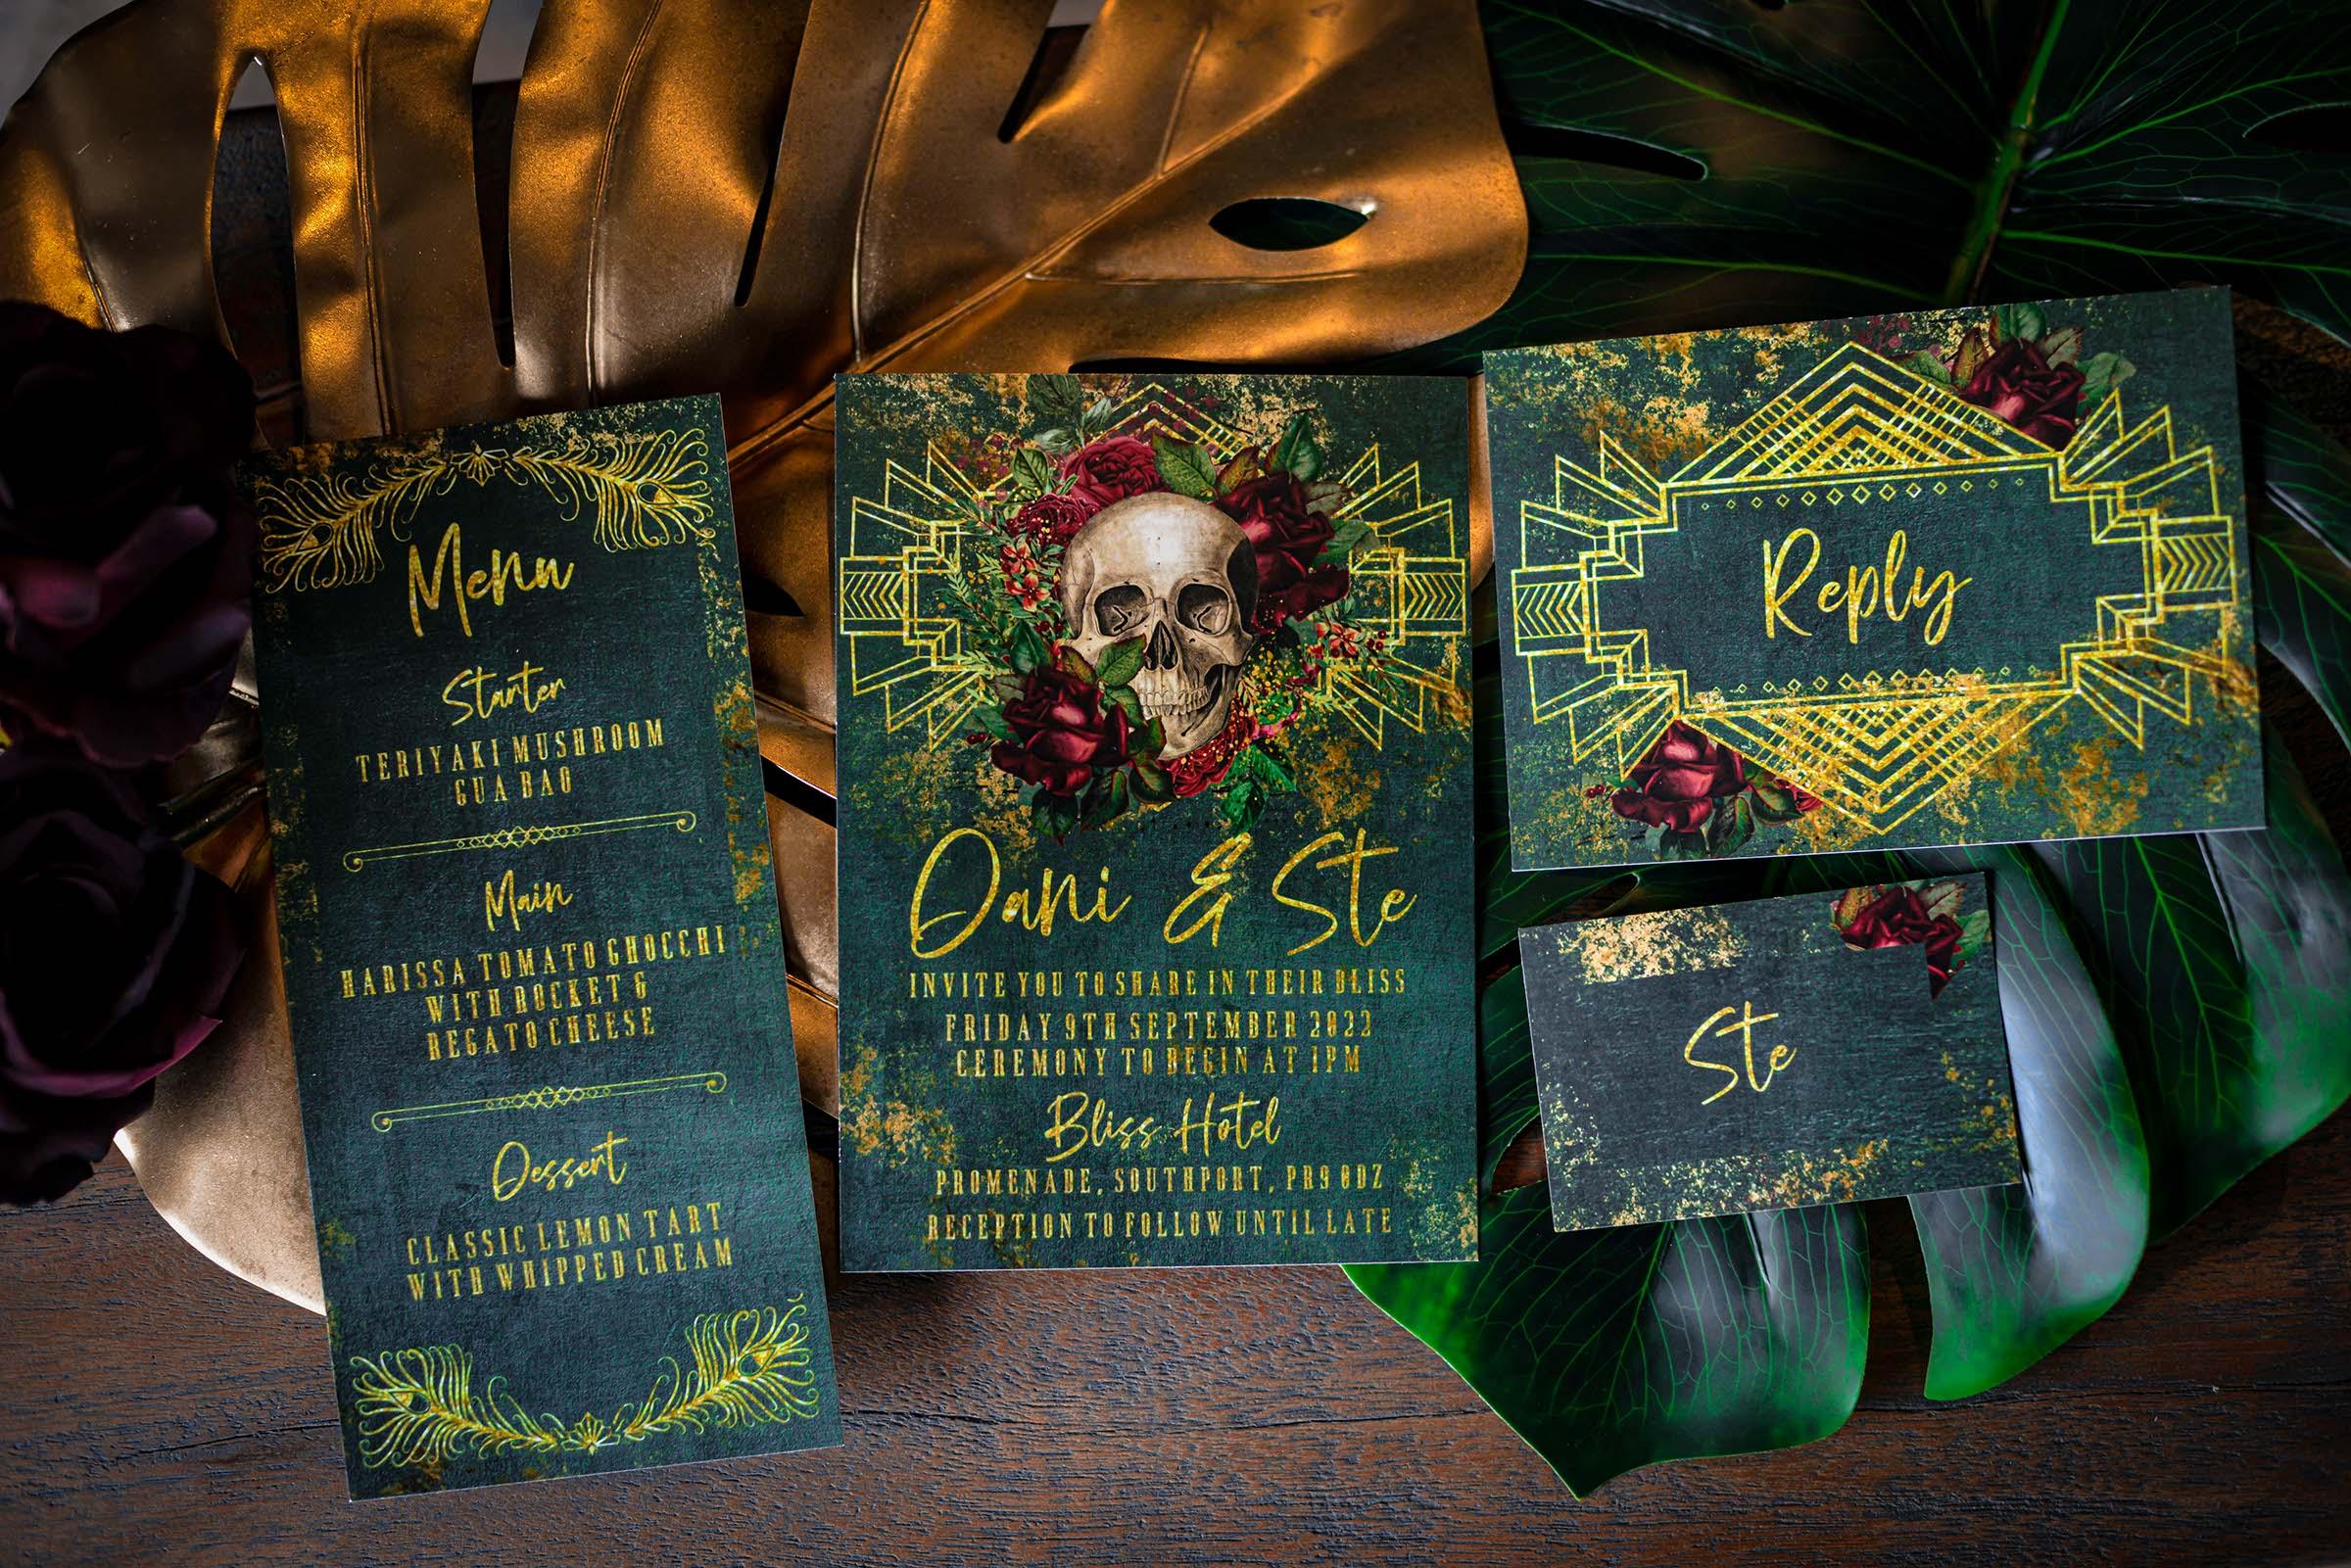 alternative luxe wedding - slytherin wedding - gothic wedding - alternative wedding - skull wedding stationery - gothic wedding stationery - alternative wedding invitations